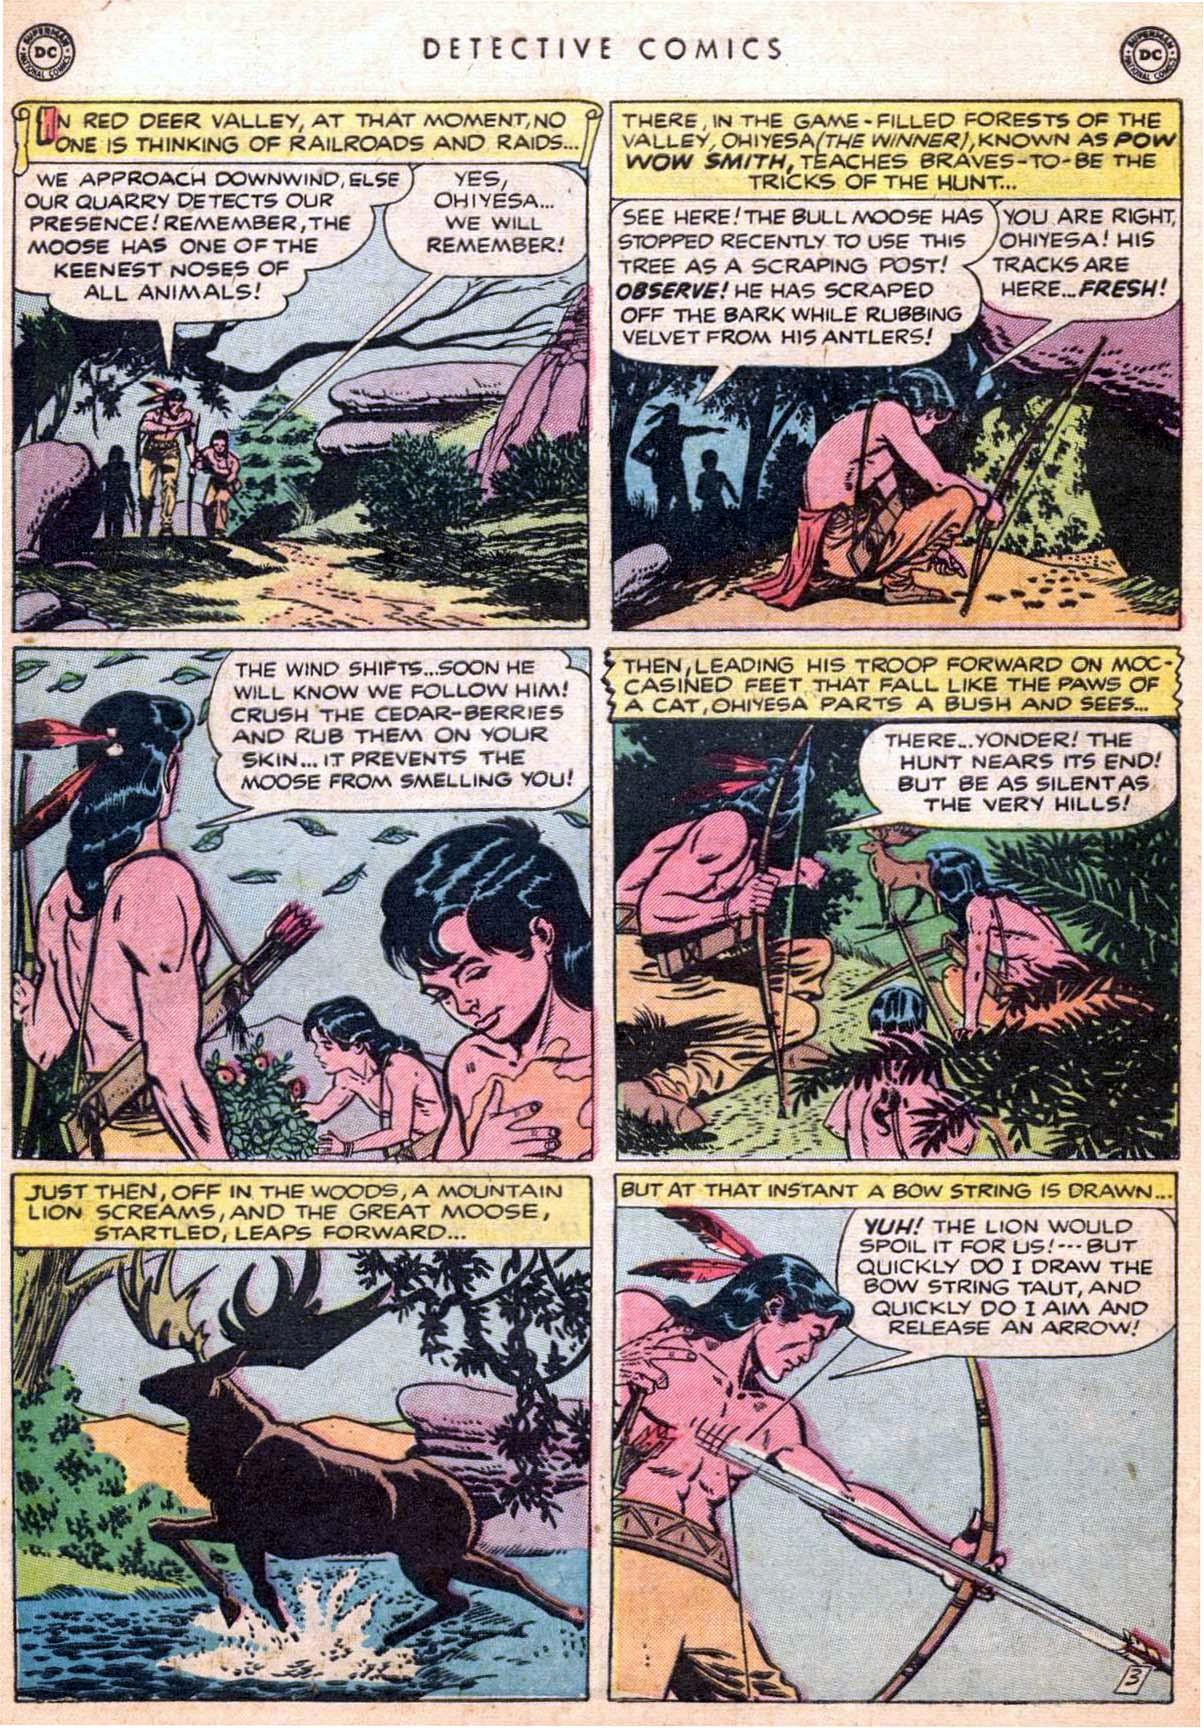 Detective Comics (1937) 157 Page 41